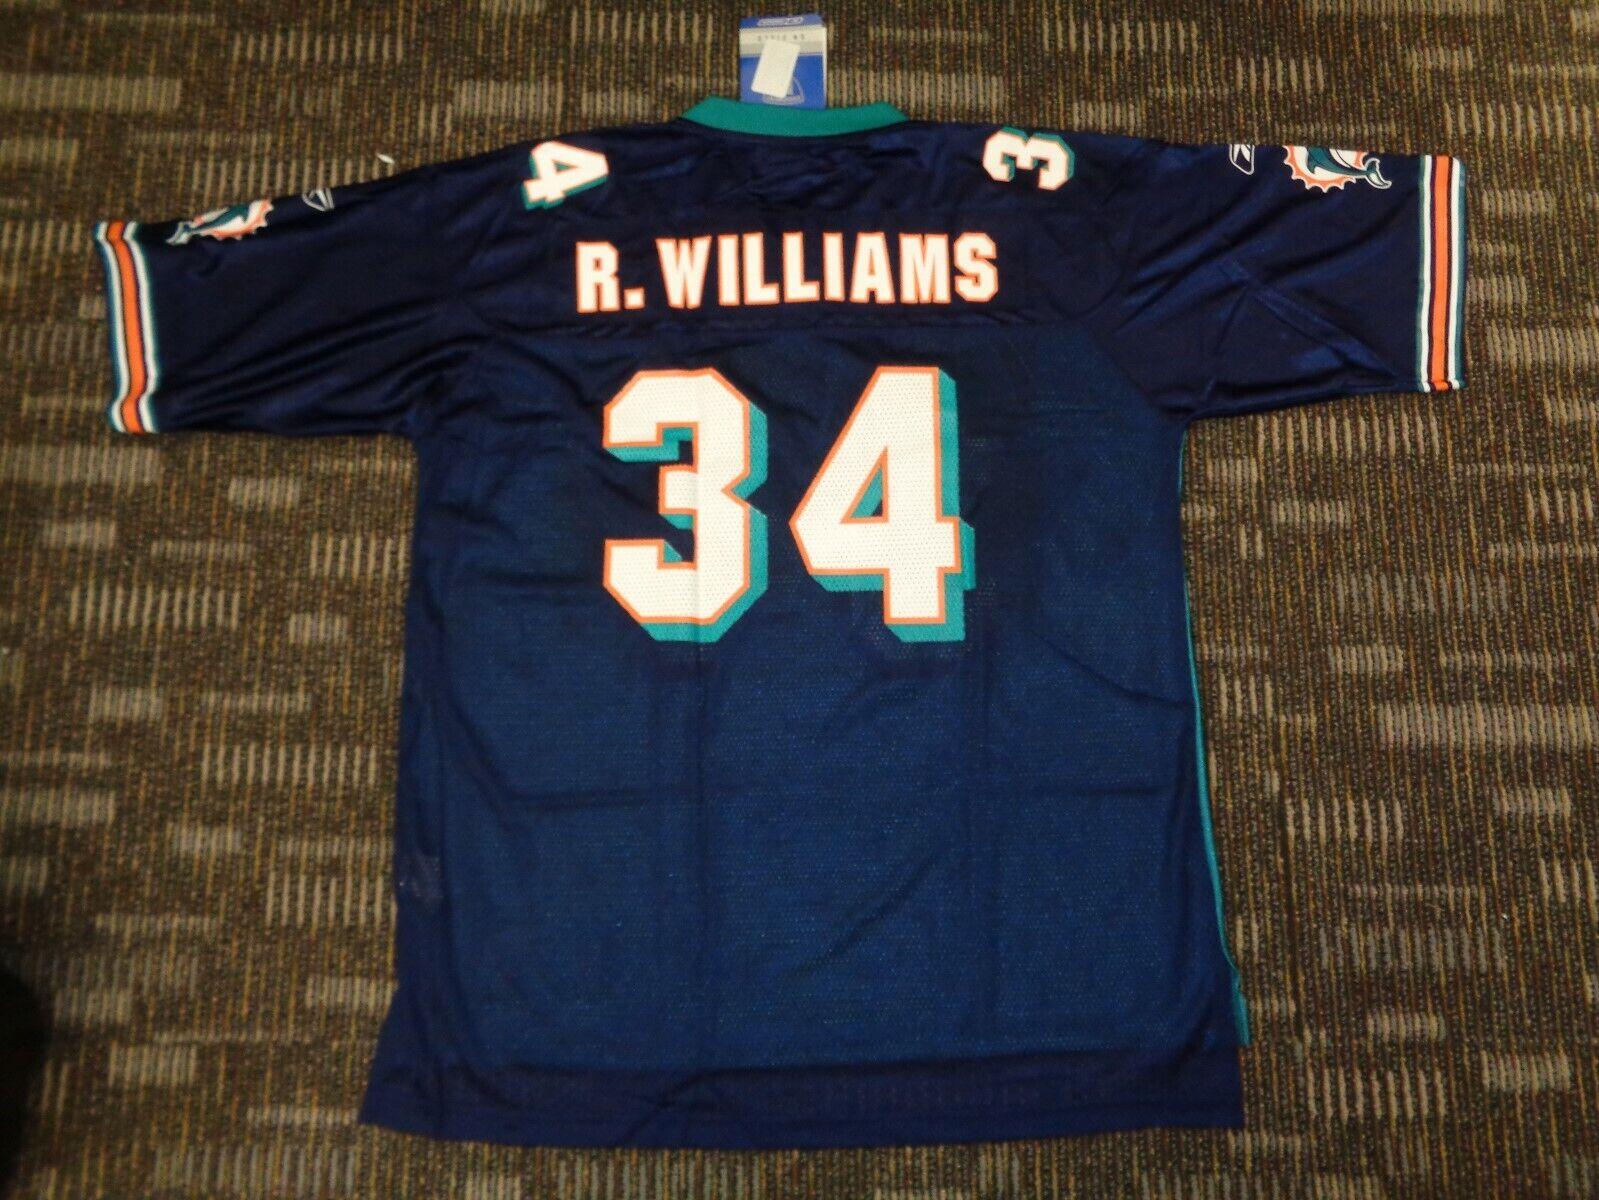 LOT-NWT RICKY WILLIAMS CAMERON WAKE MIAMI DOLPHINS REEBOK NFL CFL GAME JERSEYS - $69.99